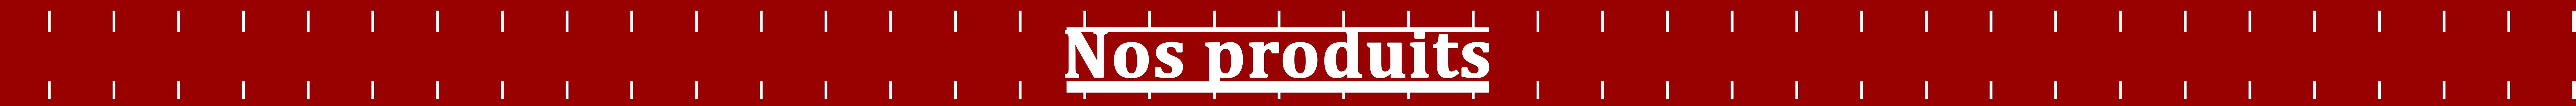 Prod-2